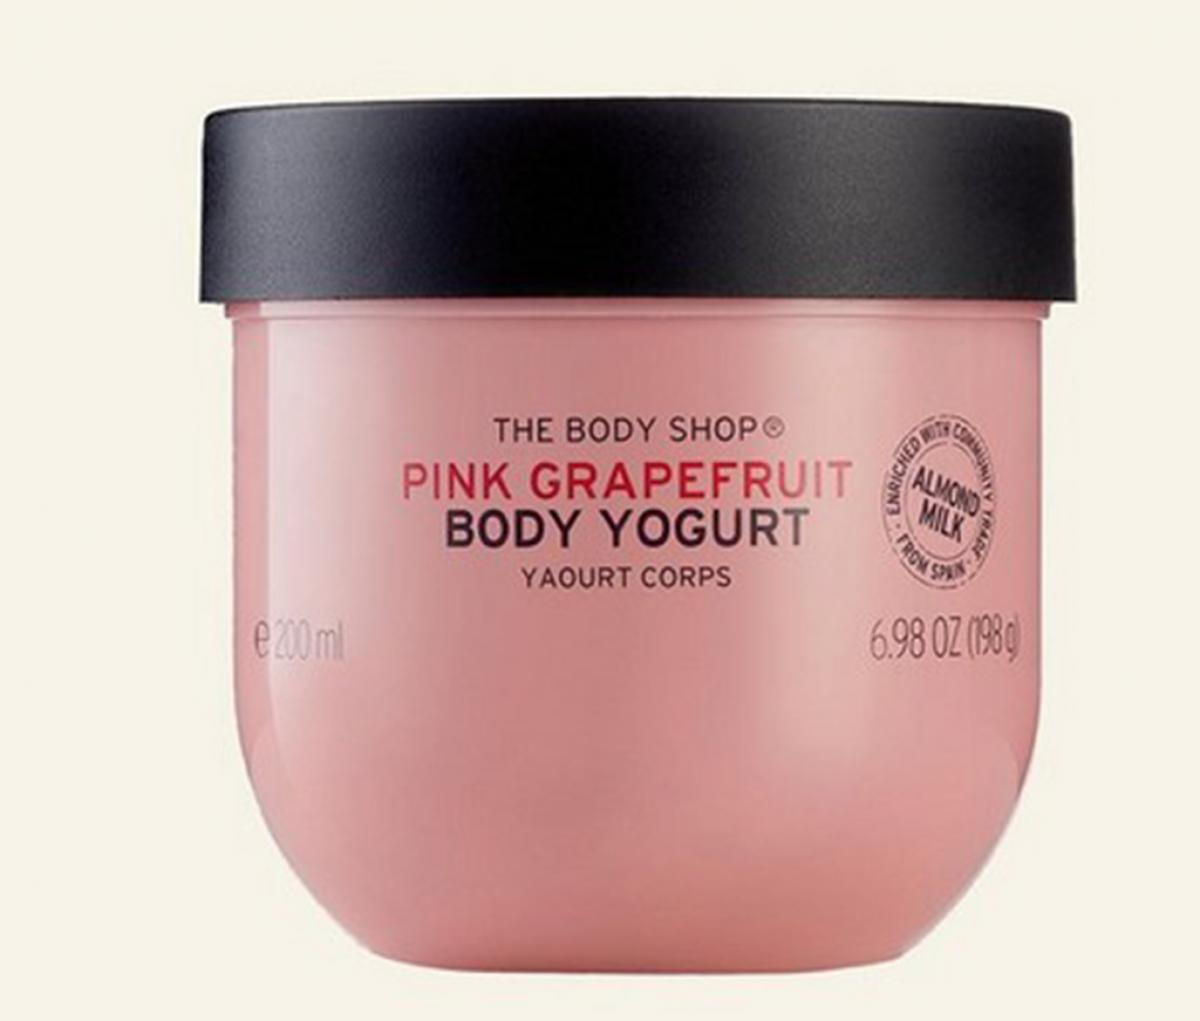 The body shop Body Yogurt Pink Grape Fruit